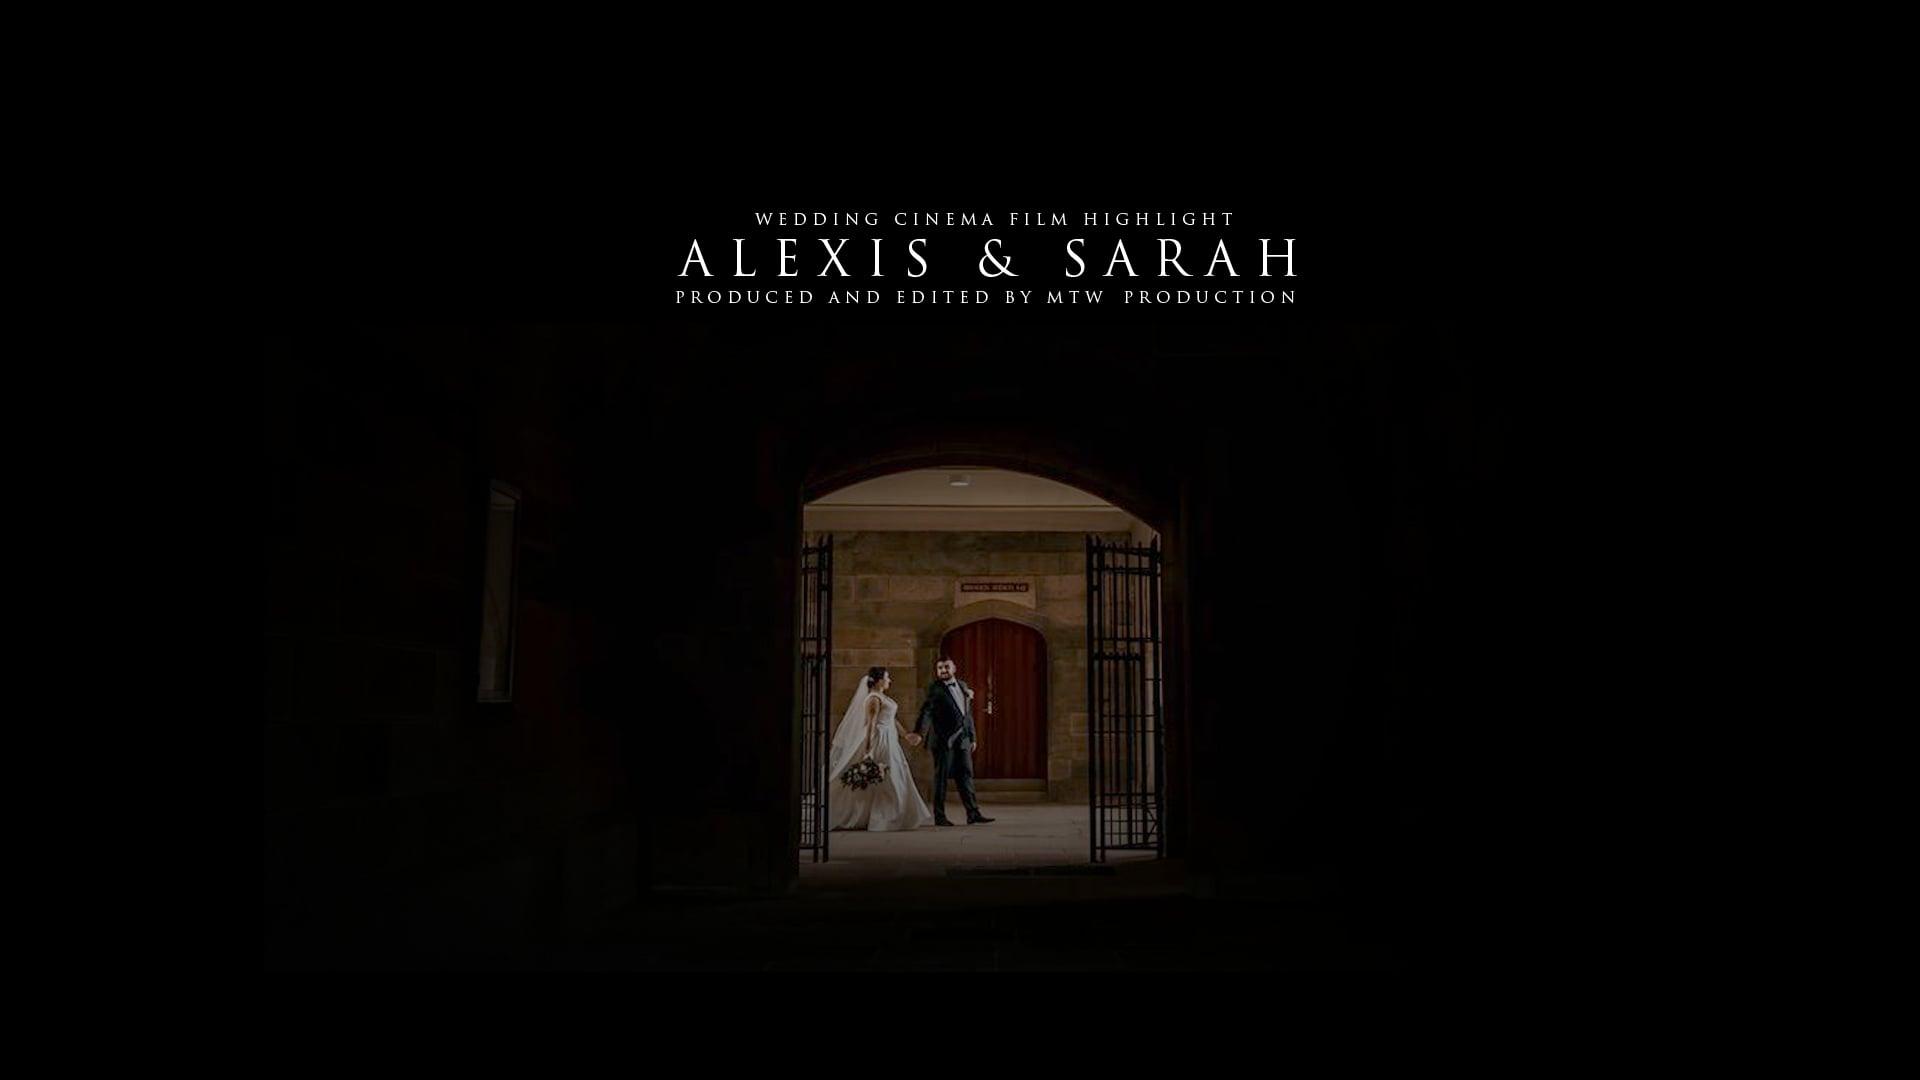 Wedding Cinema Film Highlight | Alexis and Sarah